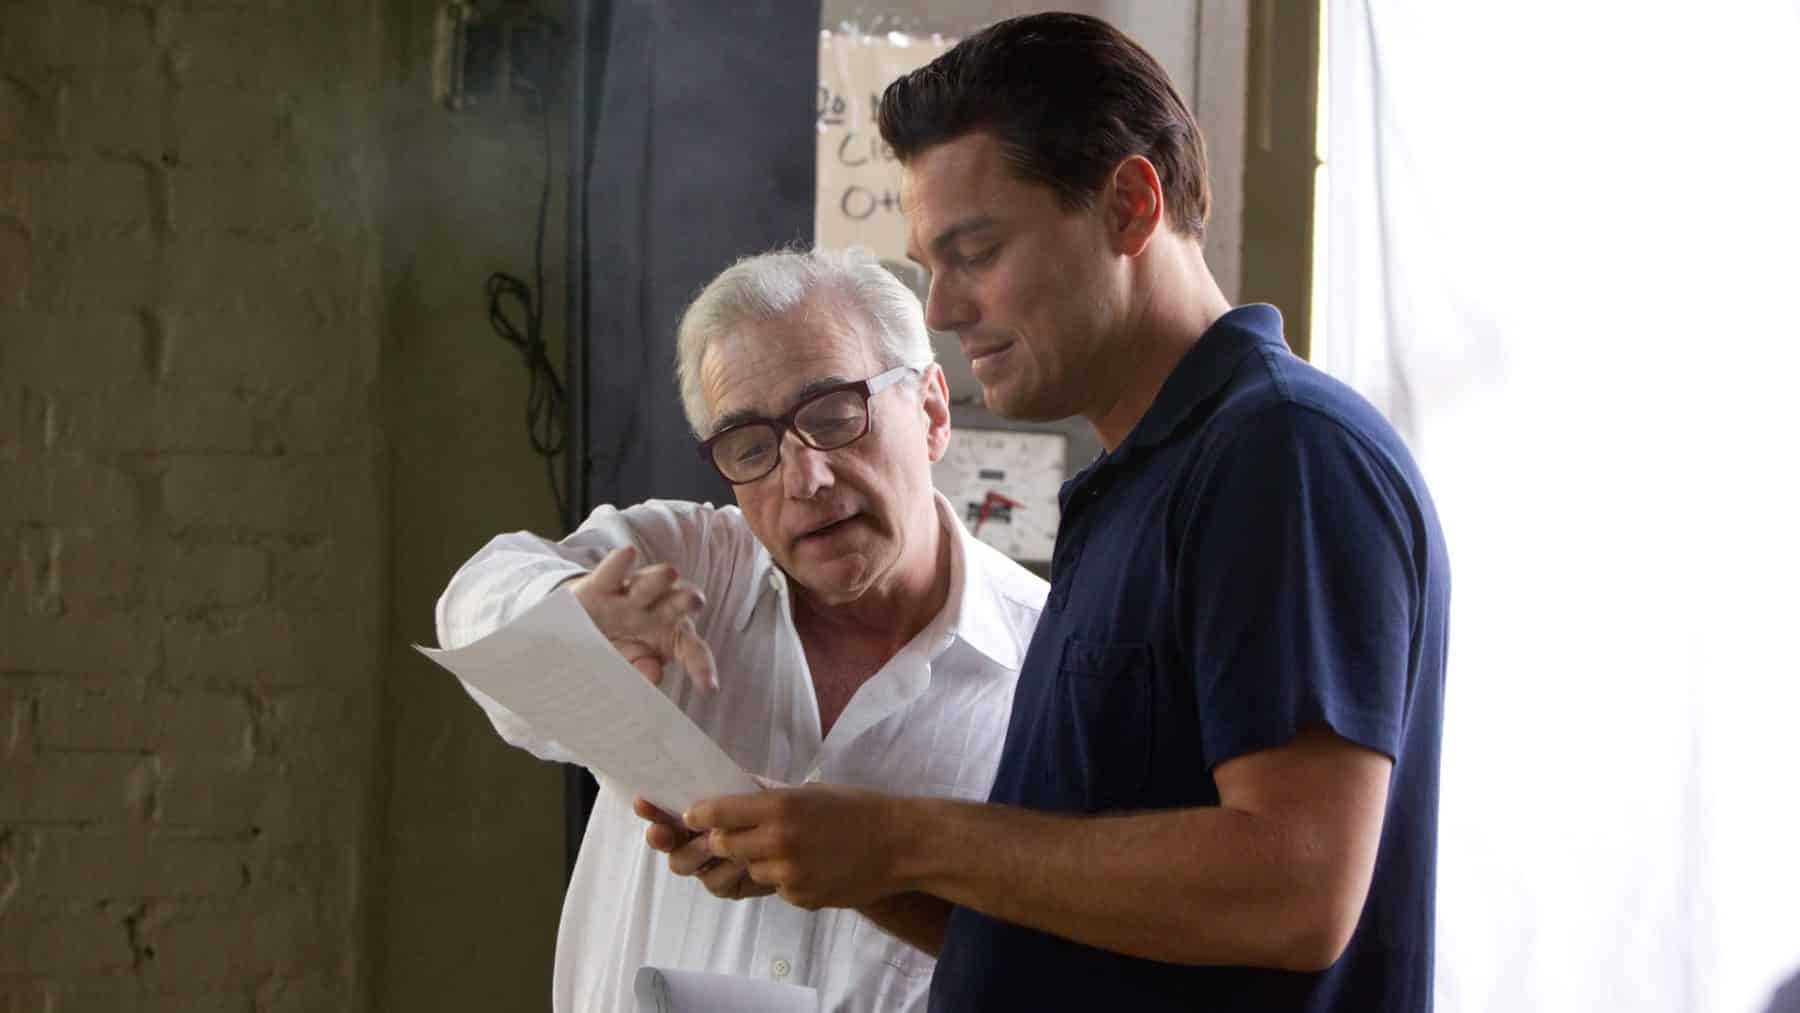 Martin Scorsese y Leonardo DiCaprio se reúnen en Killers of the Flower Moon basada en el bestseller homónimo